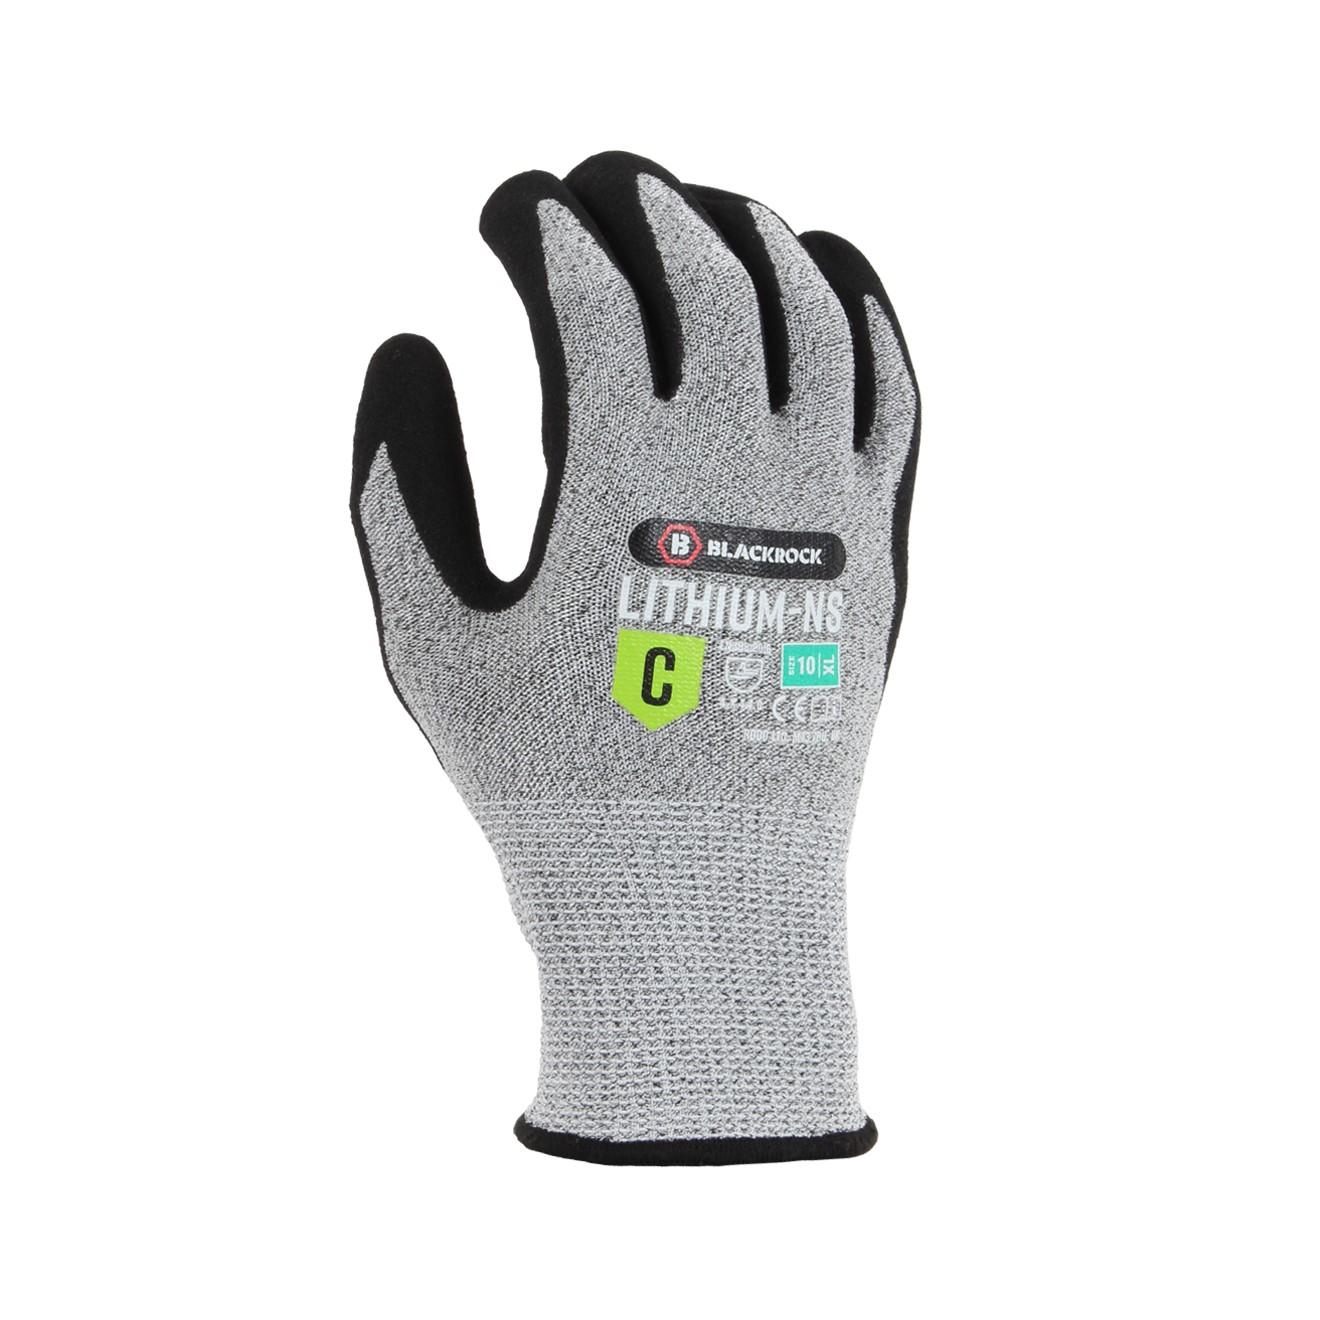 Lithium-NS Cut Resistant Glove